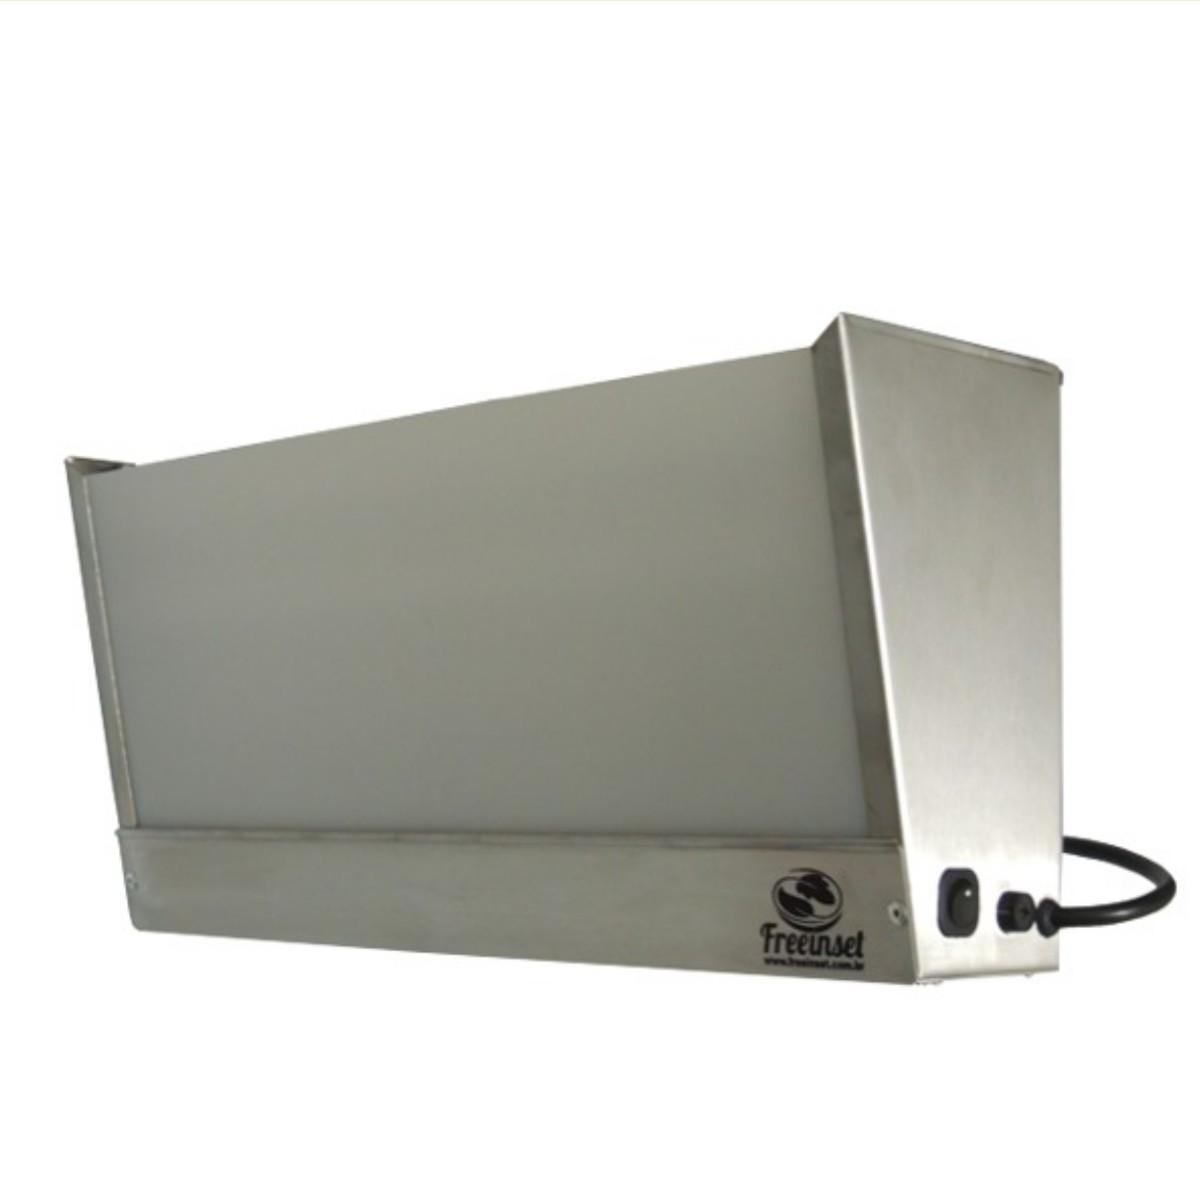 Box 1 Armadilha Luminosa Matar Mosca mosquito Inox 60w 110m2